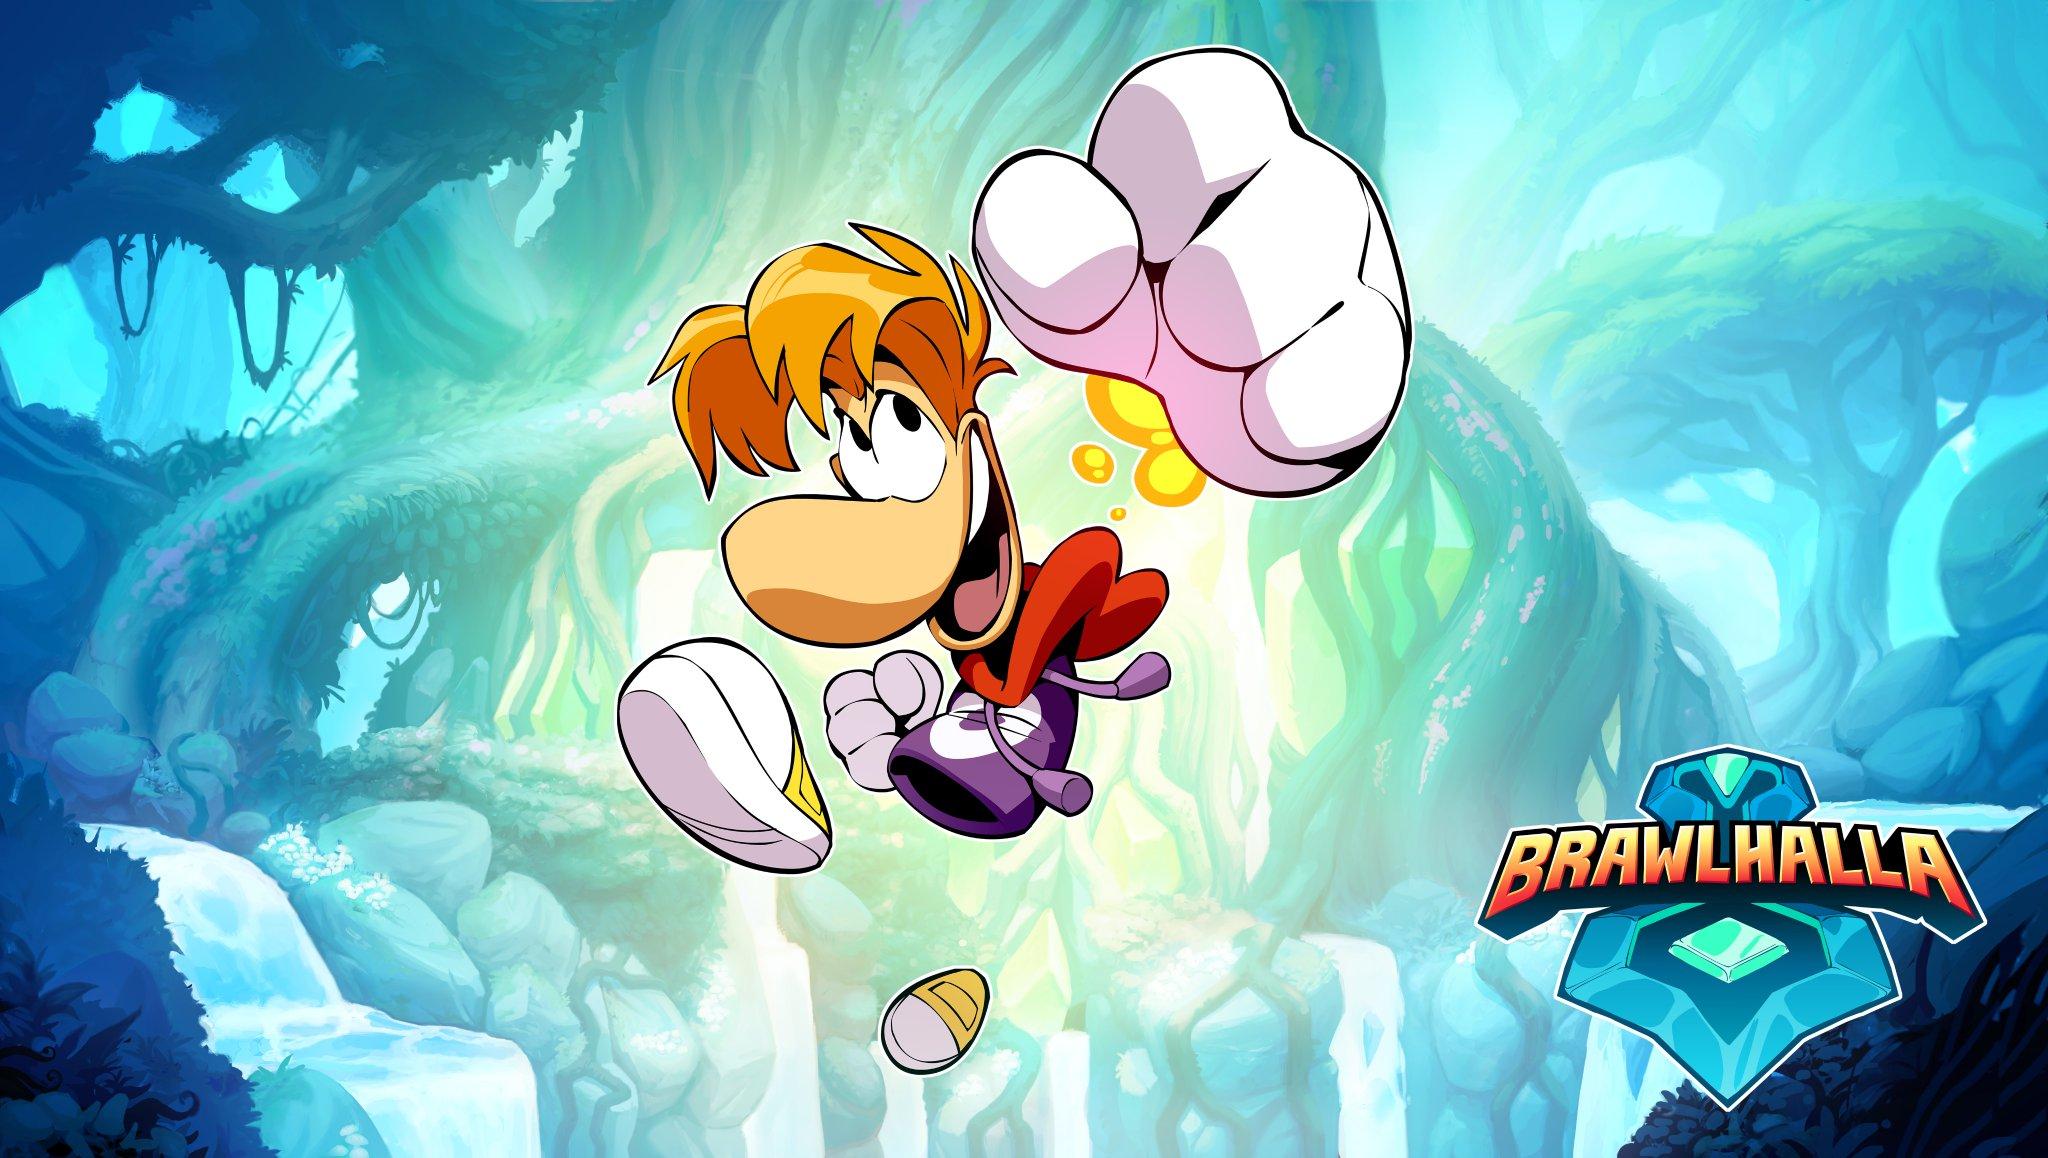 Brawlhalla to add Rayman on November 6 - Gematsu